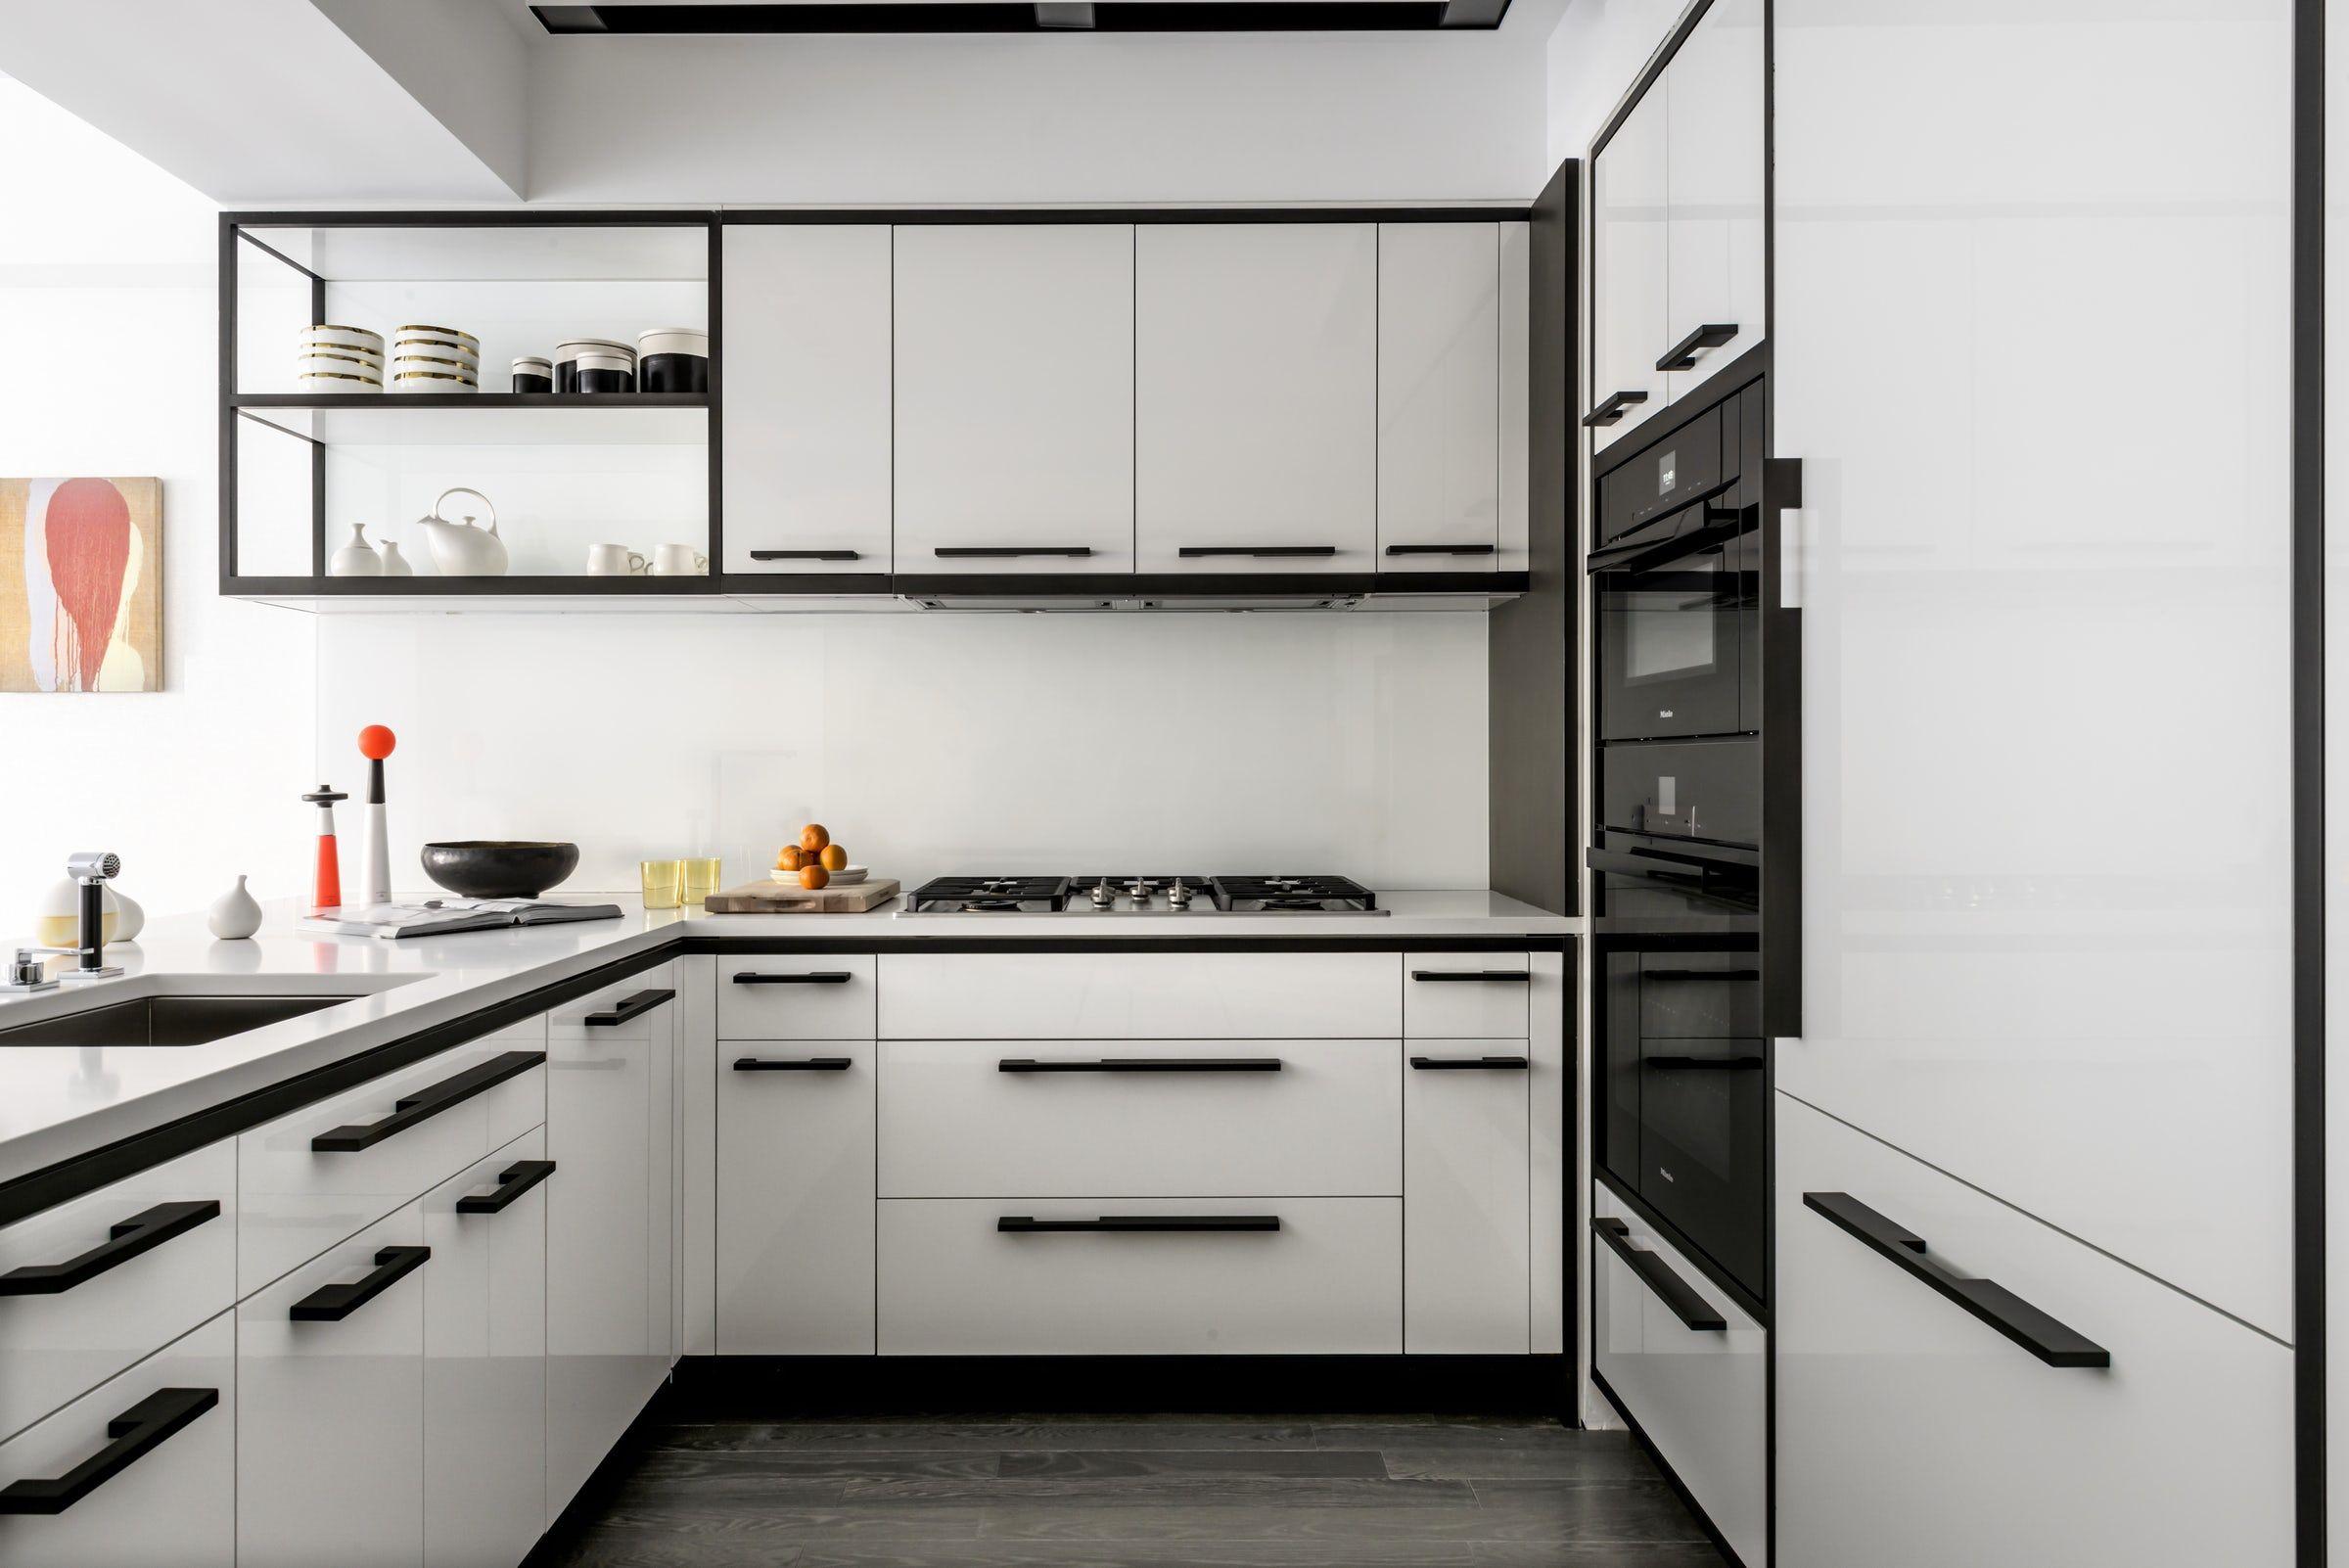 nyc soho kitchen accessories by elias associates kitchen accessories kitchen interior kitchen on kitchen interior accessories id=39174